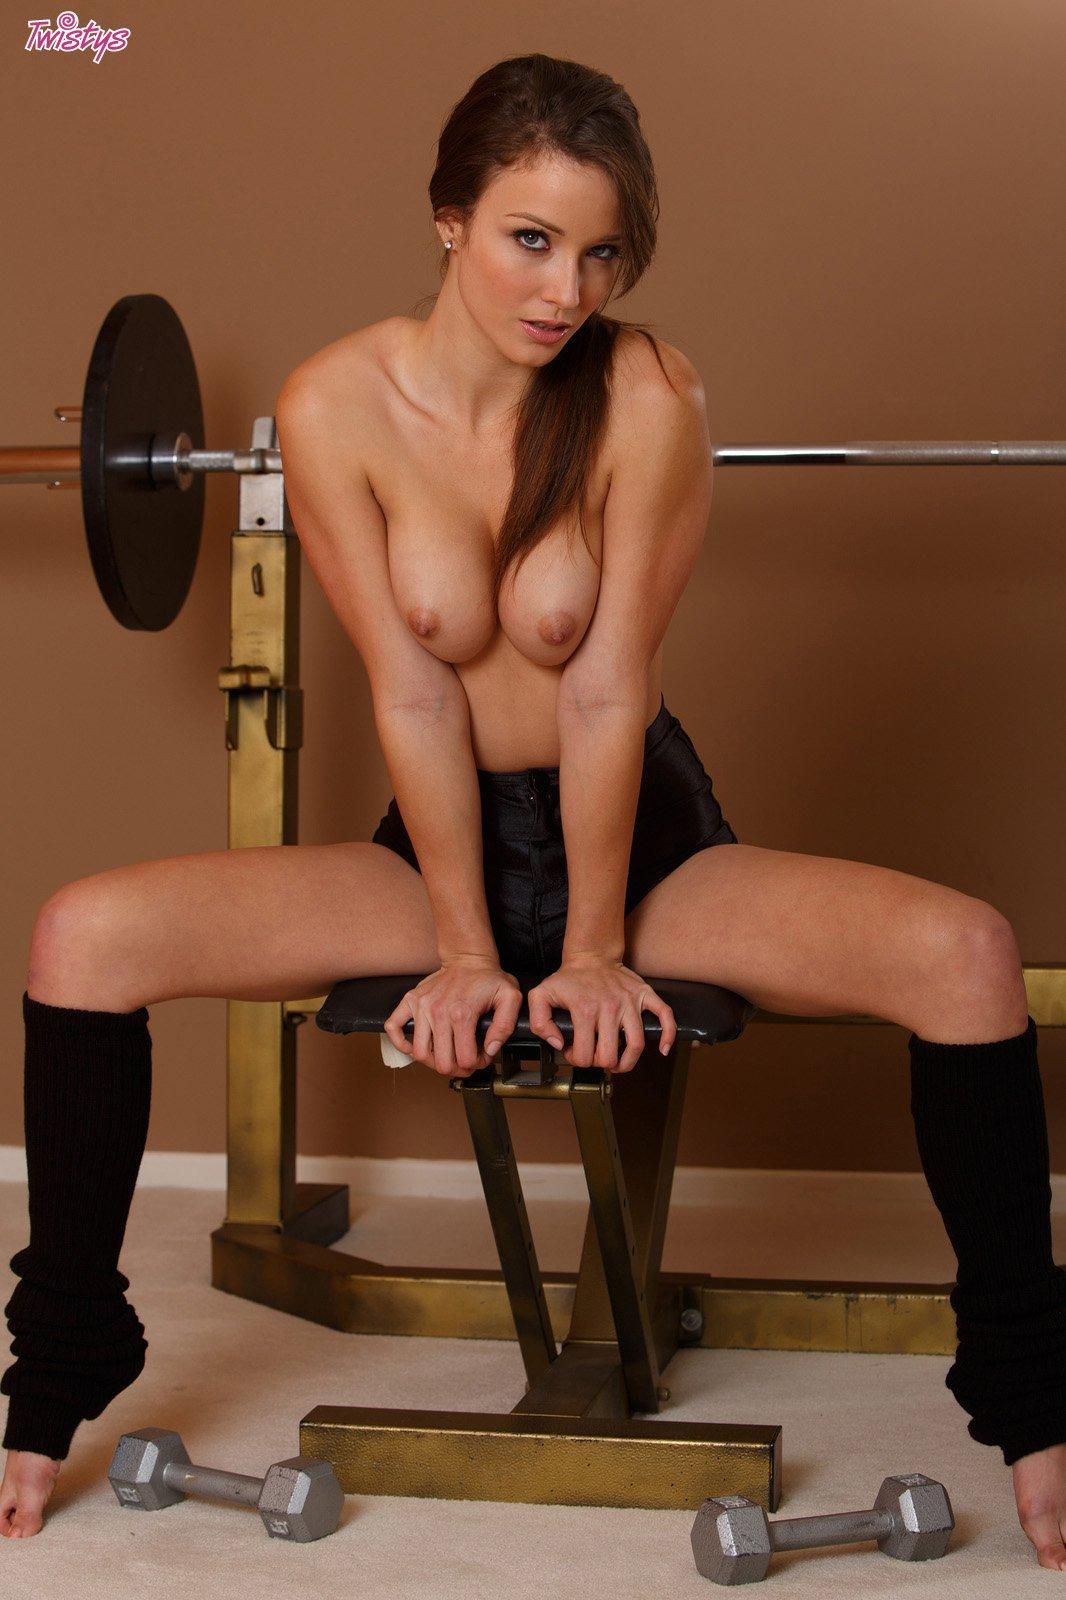 В спортзале - Фото галерея 1074217